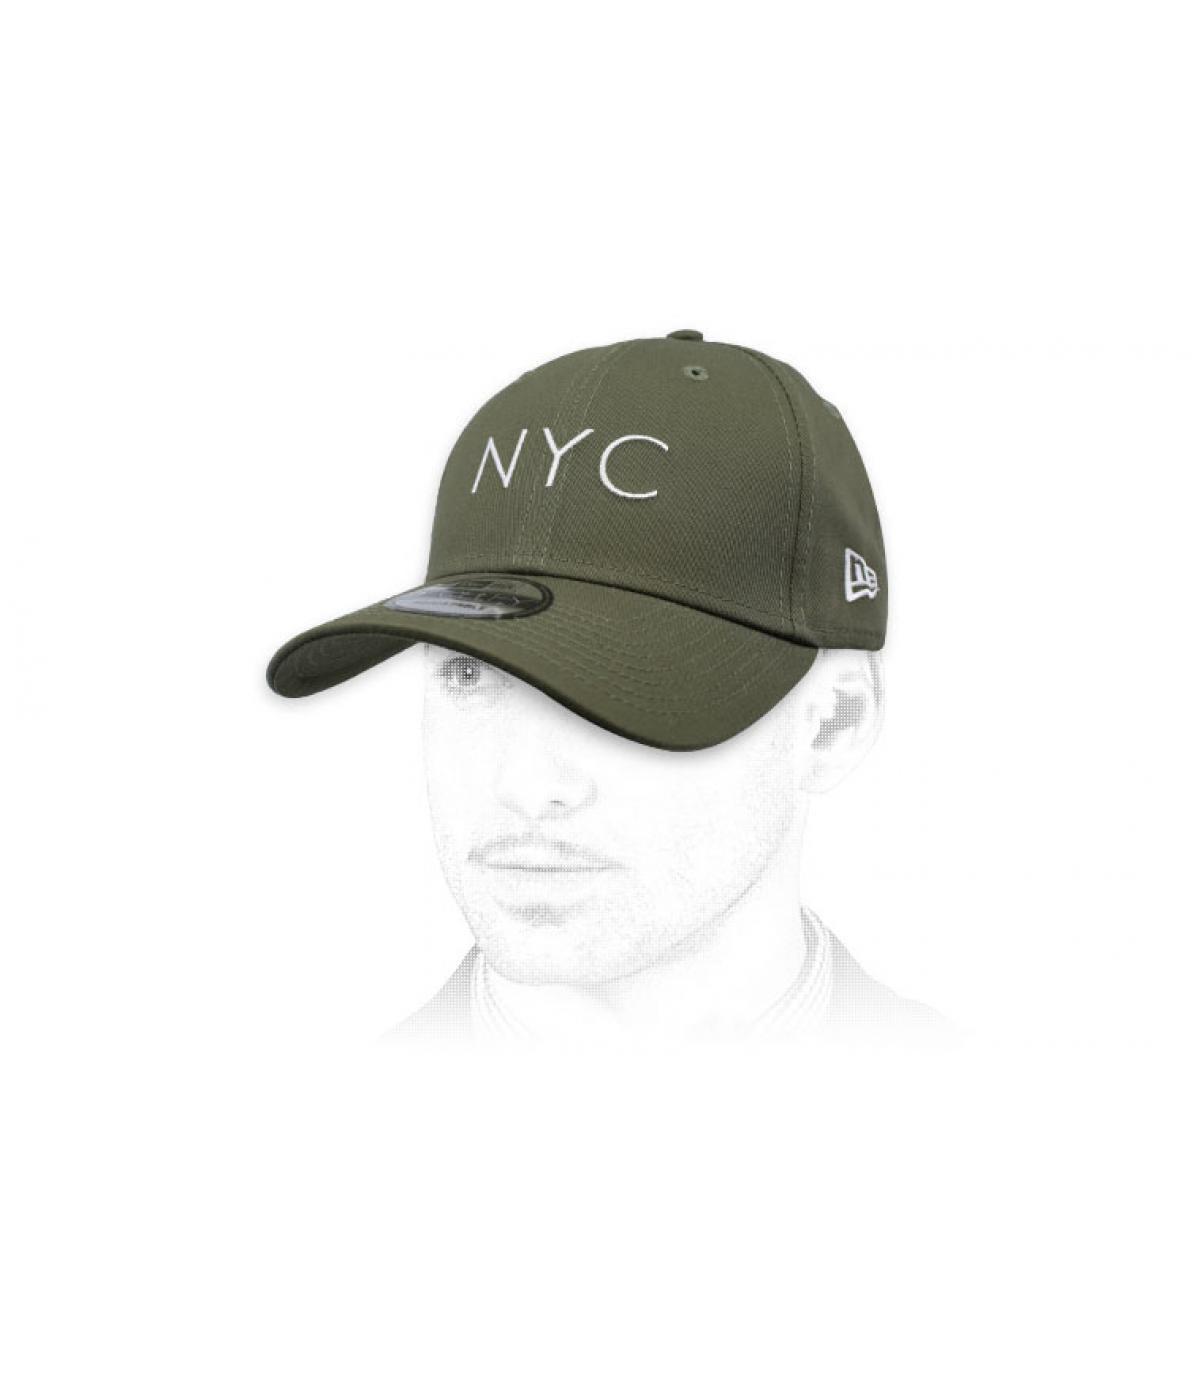 gorra NYC verde